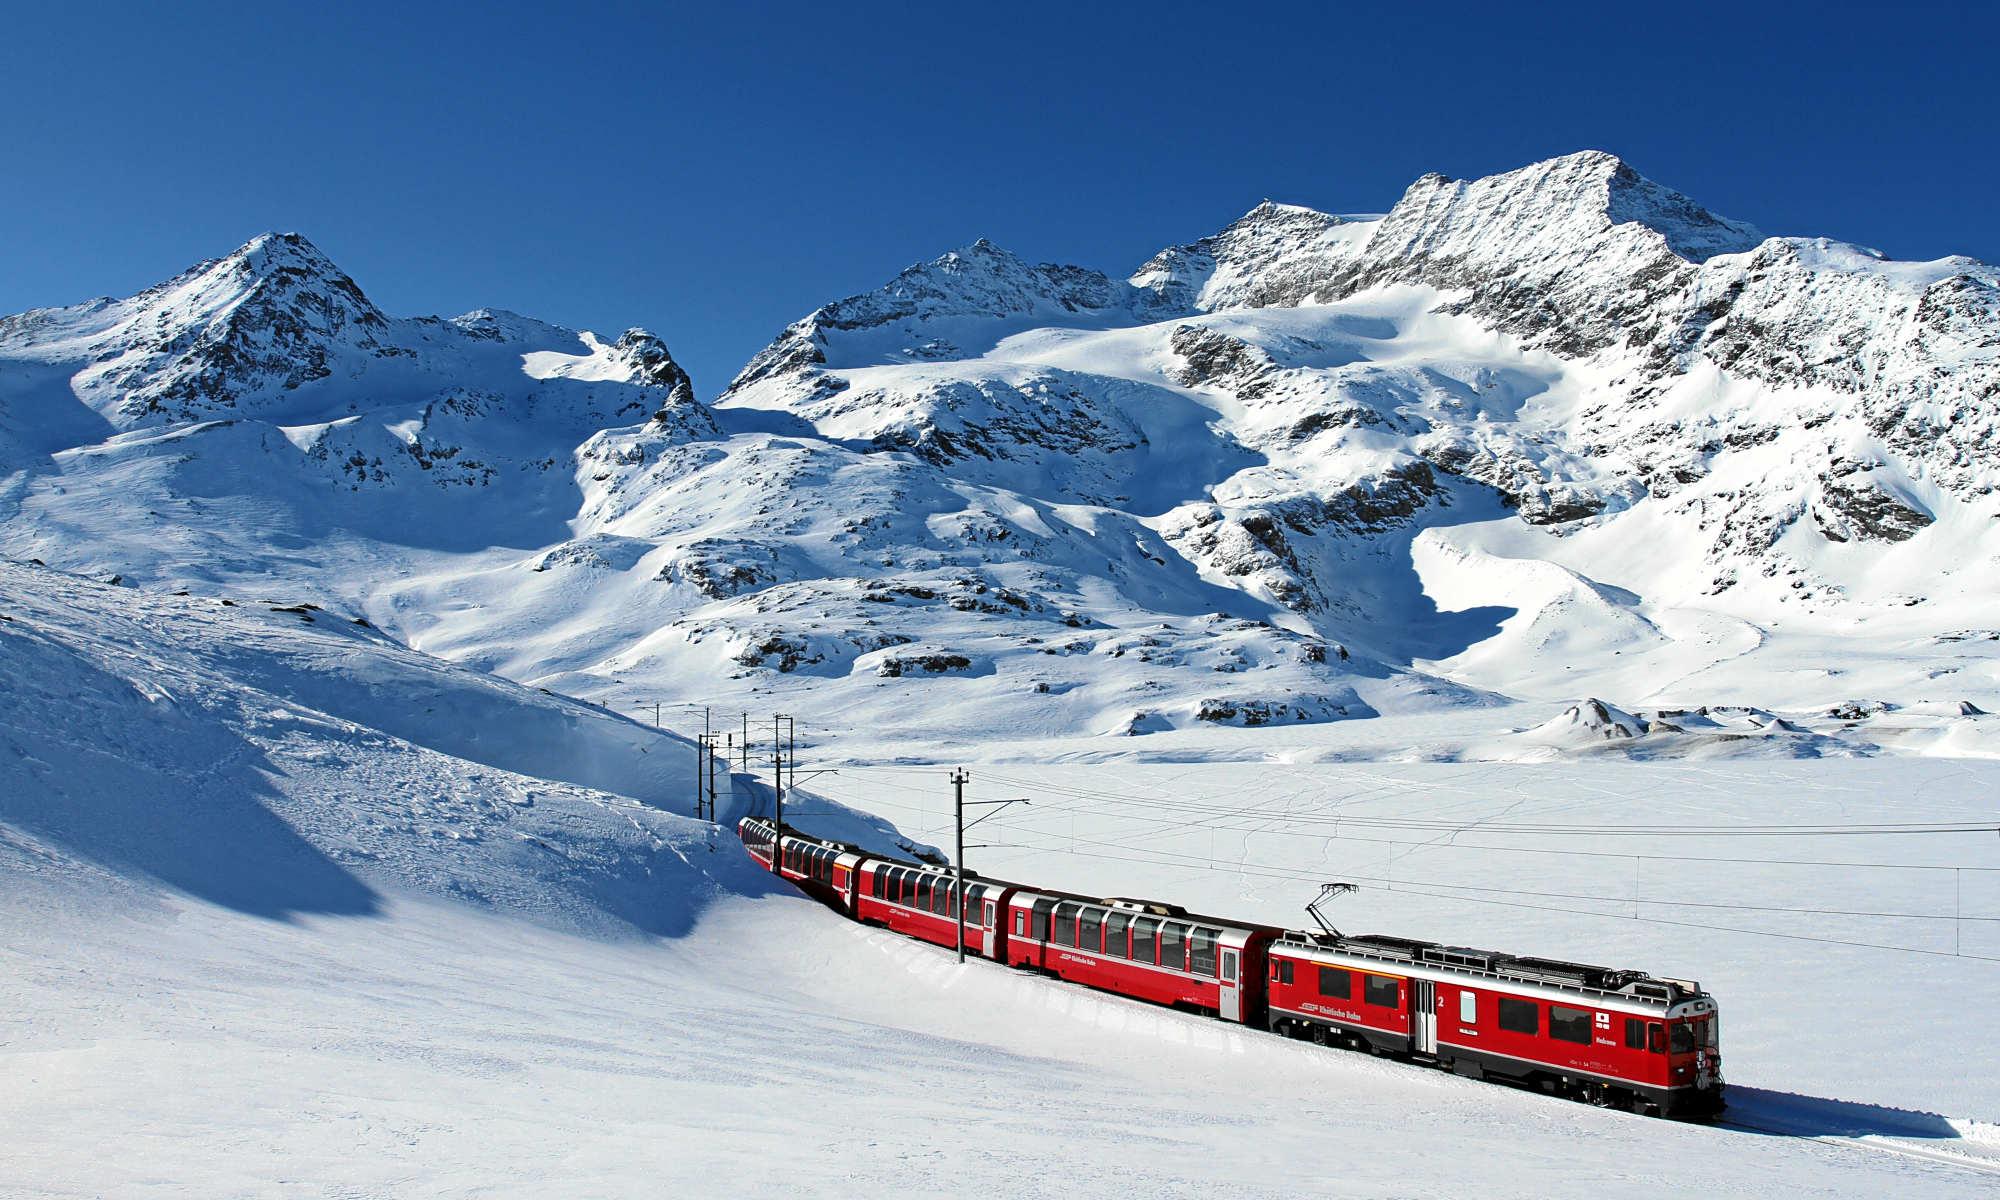 Der Bernina Express fährt entlang des Lago Bianco in den Schweizer Alpen.